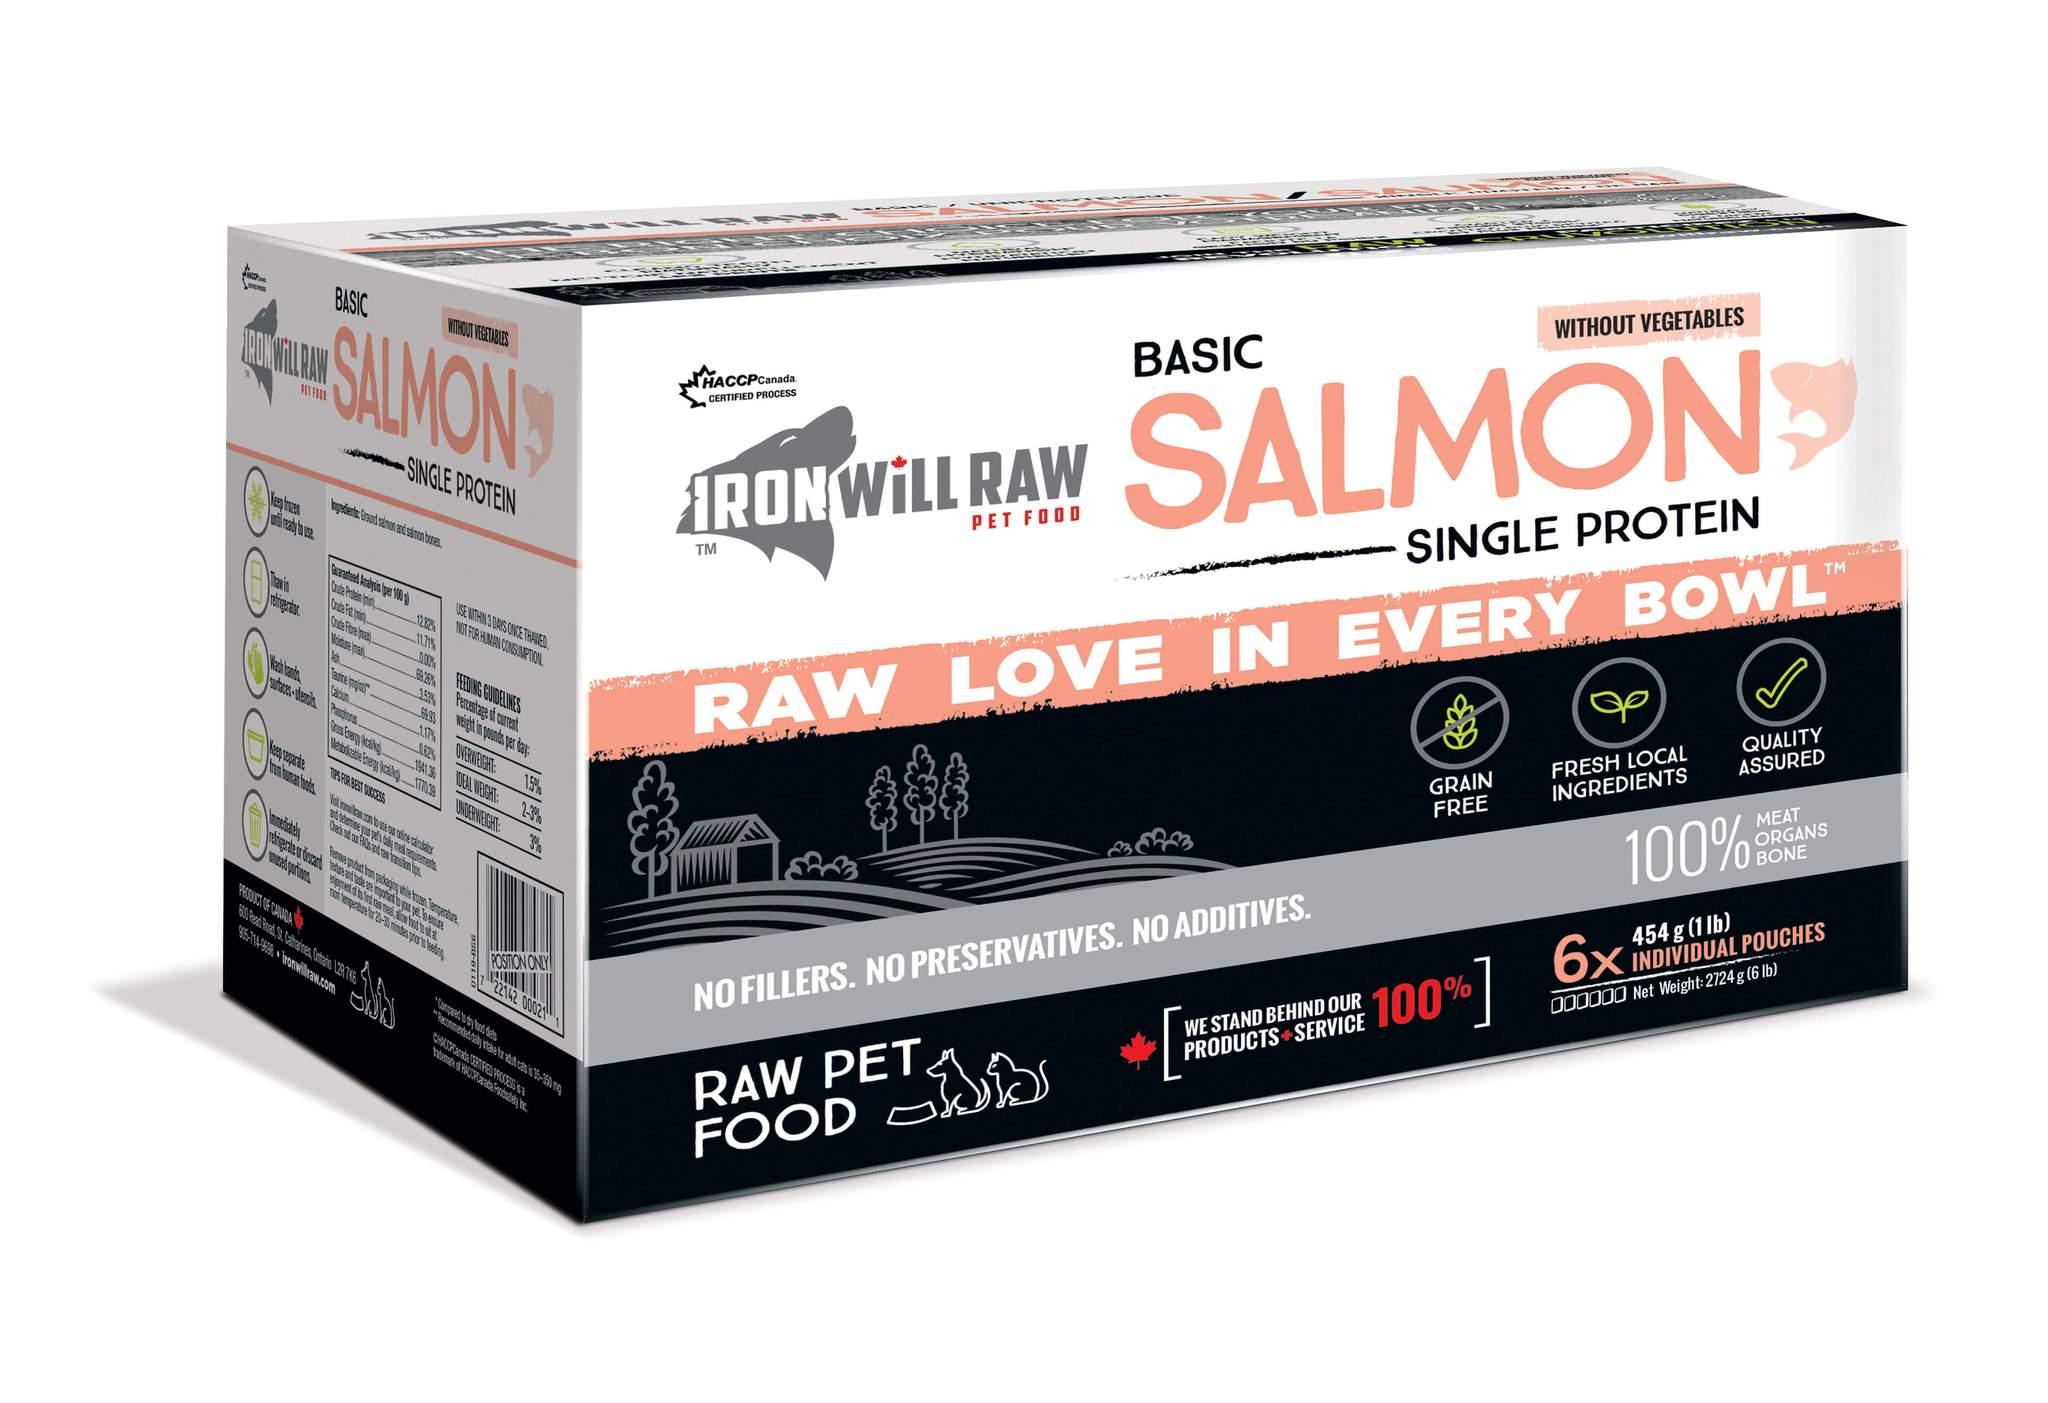 Iron Will Raw Basic Salmon Frozen Cat & Dog Food, 6-lb